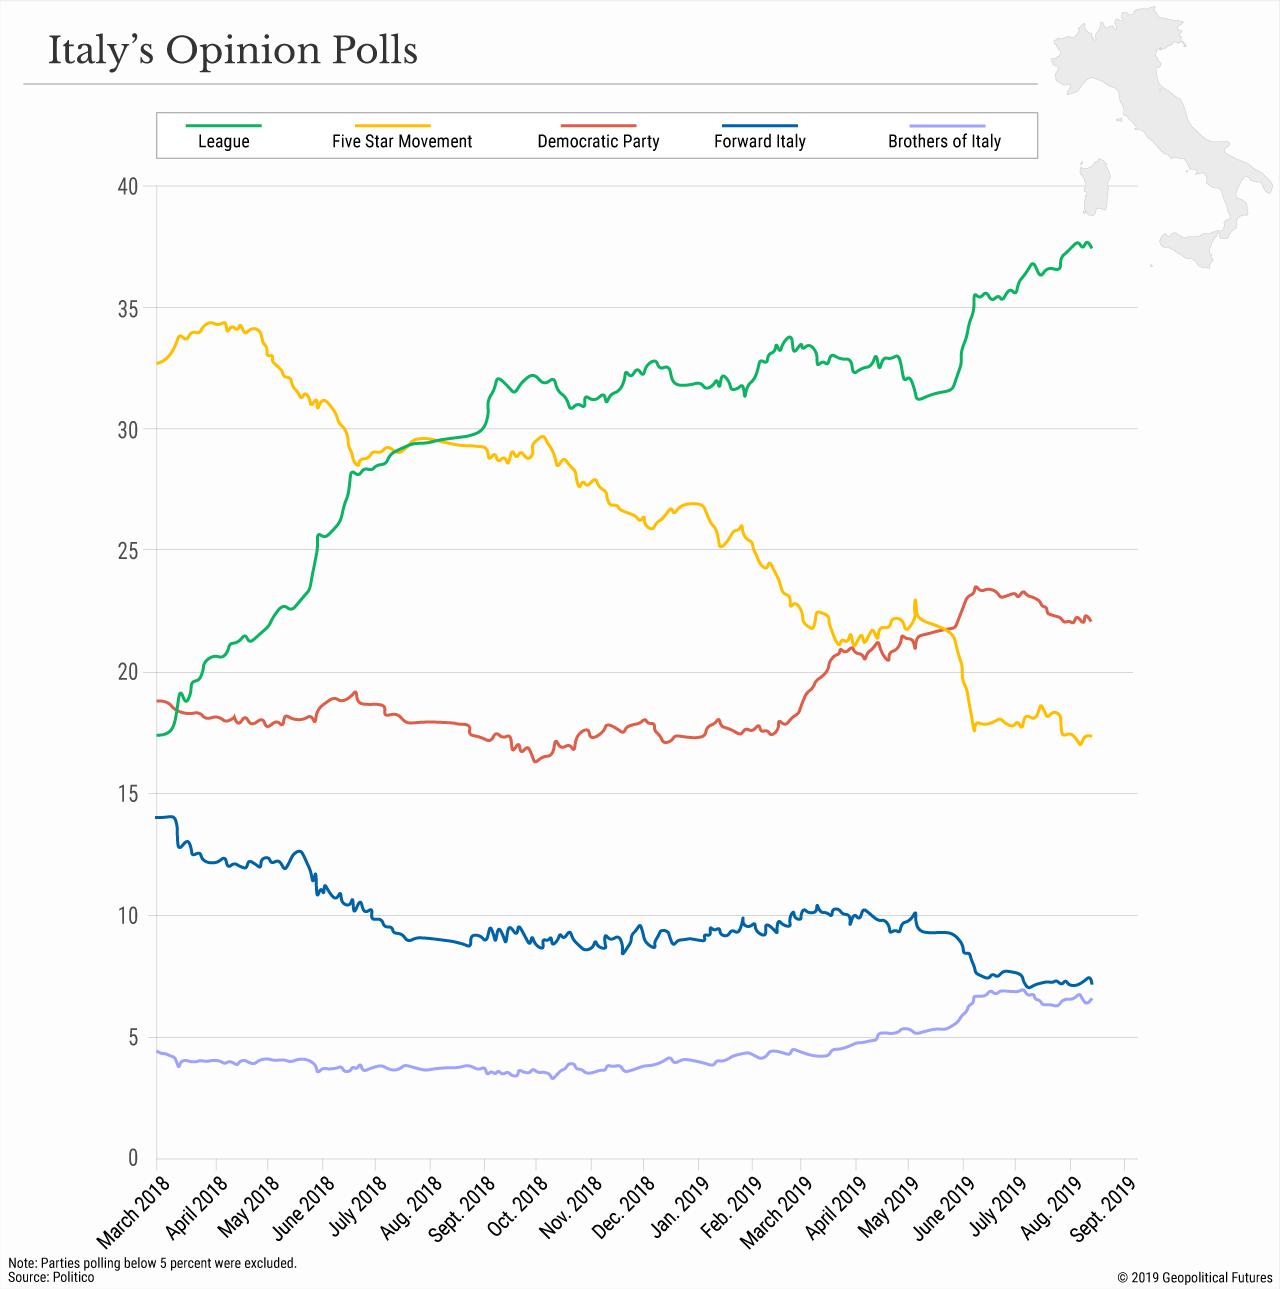 Italy's Opinion Polls